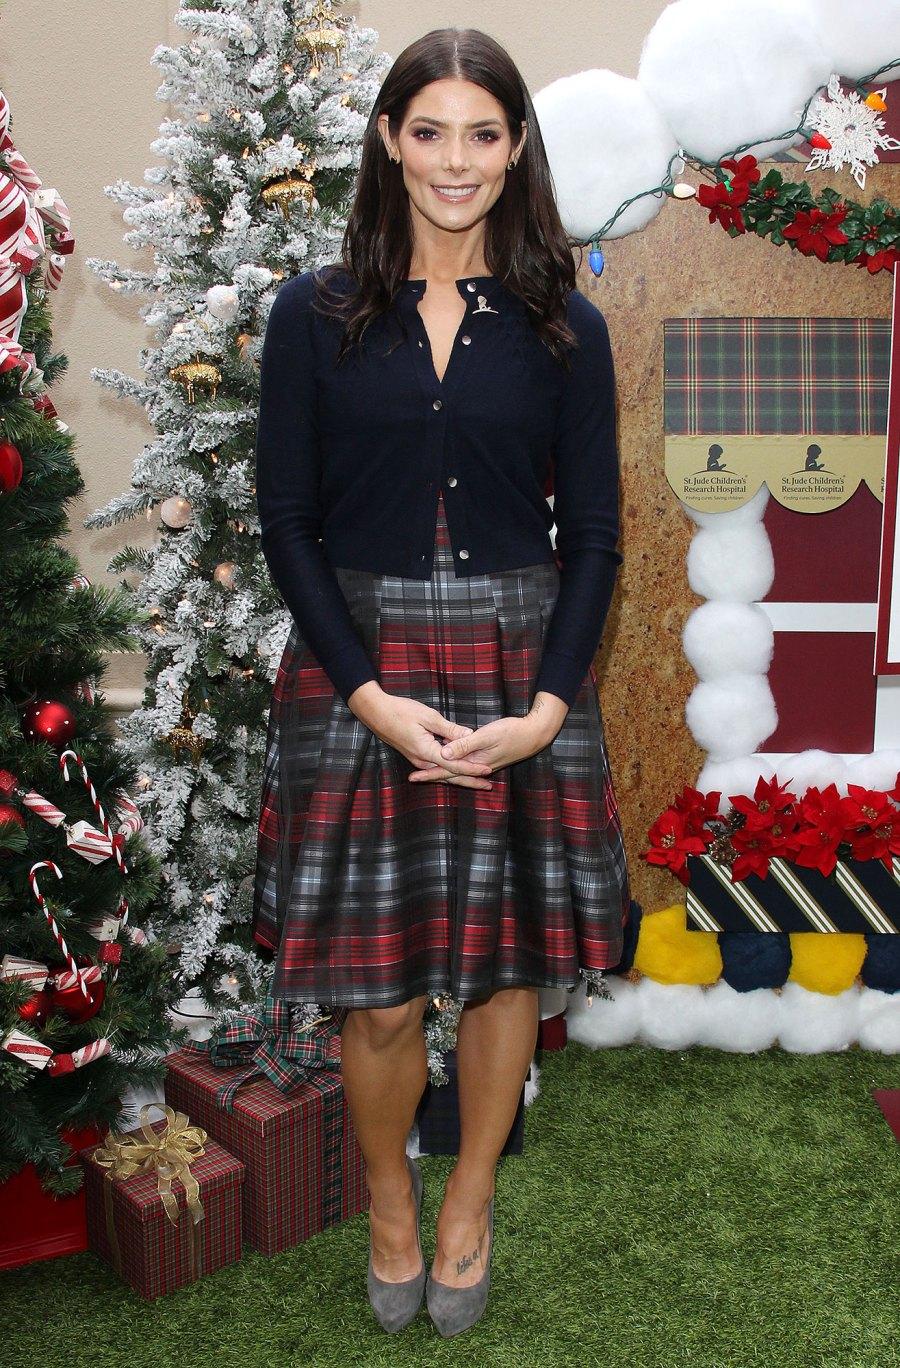 Ashley Greene An Unforgettable Christmas Hallmark Movies Christmas Gallery